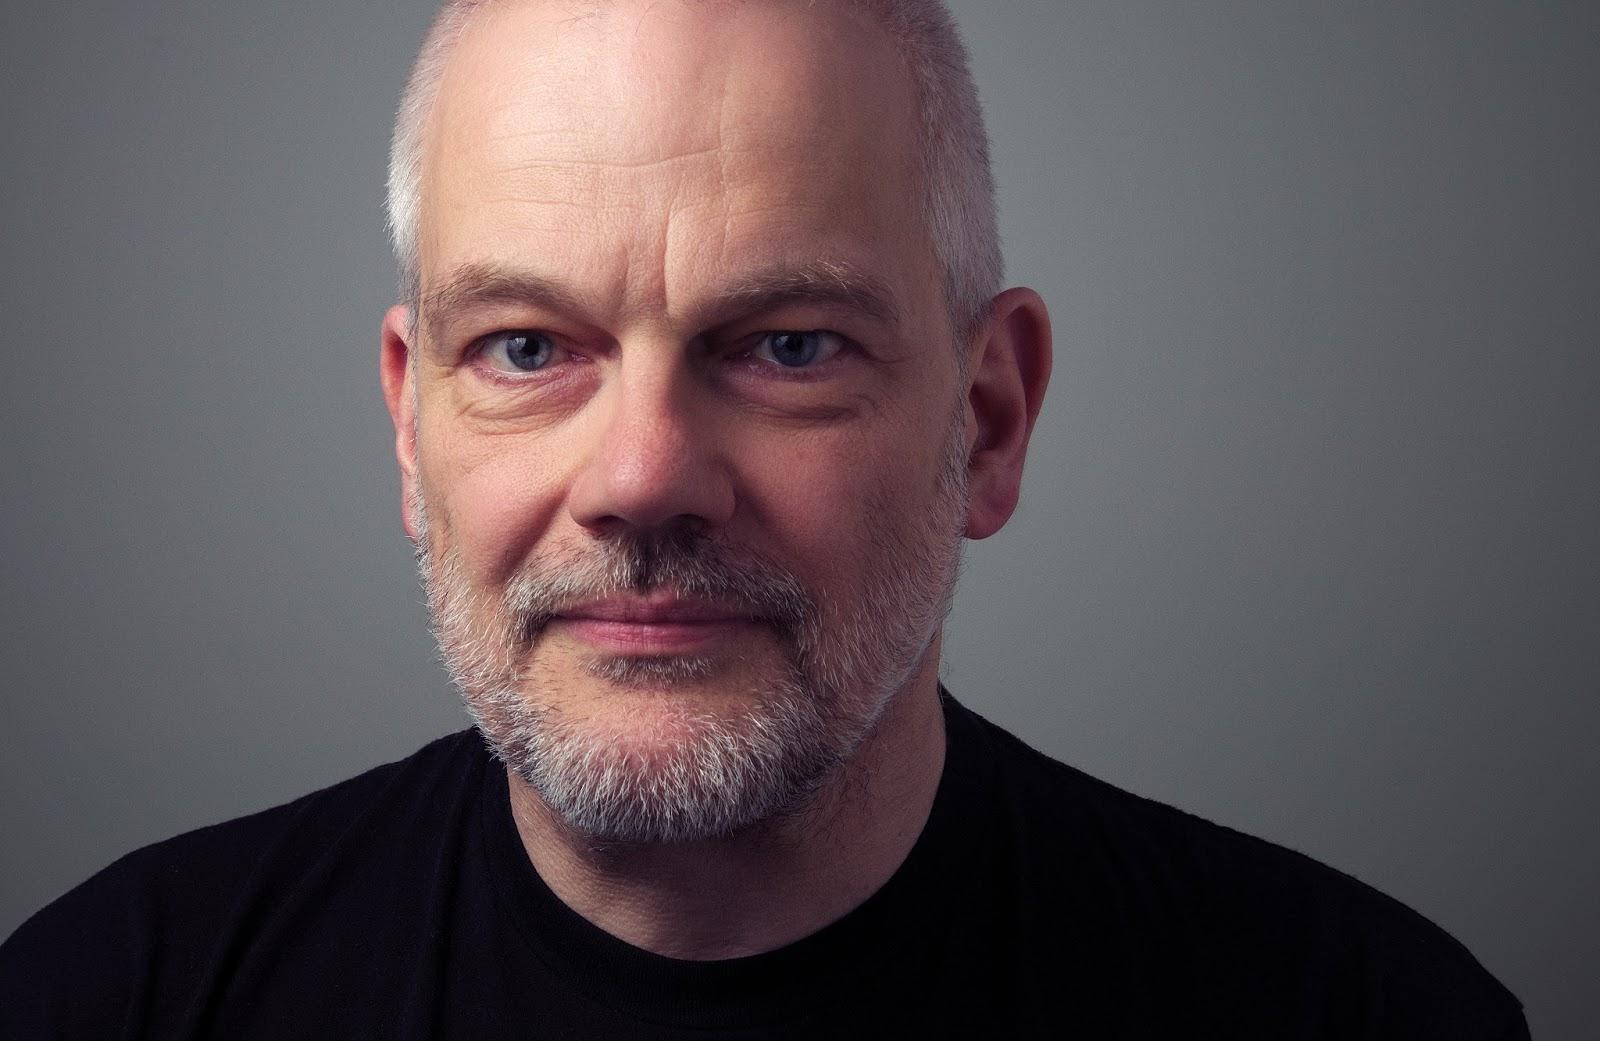 Rolf Steinort headshot portrait Meet the GIMP Pat David